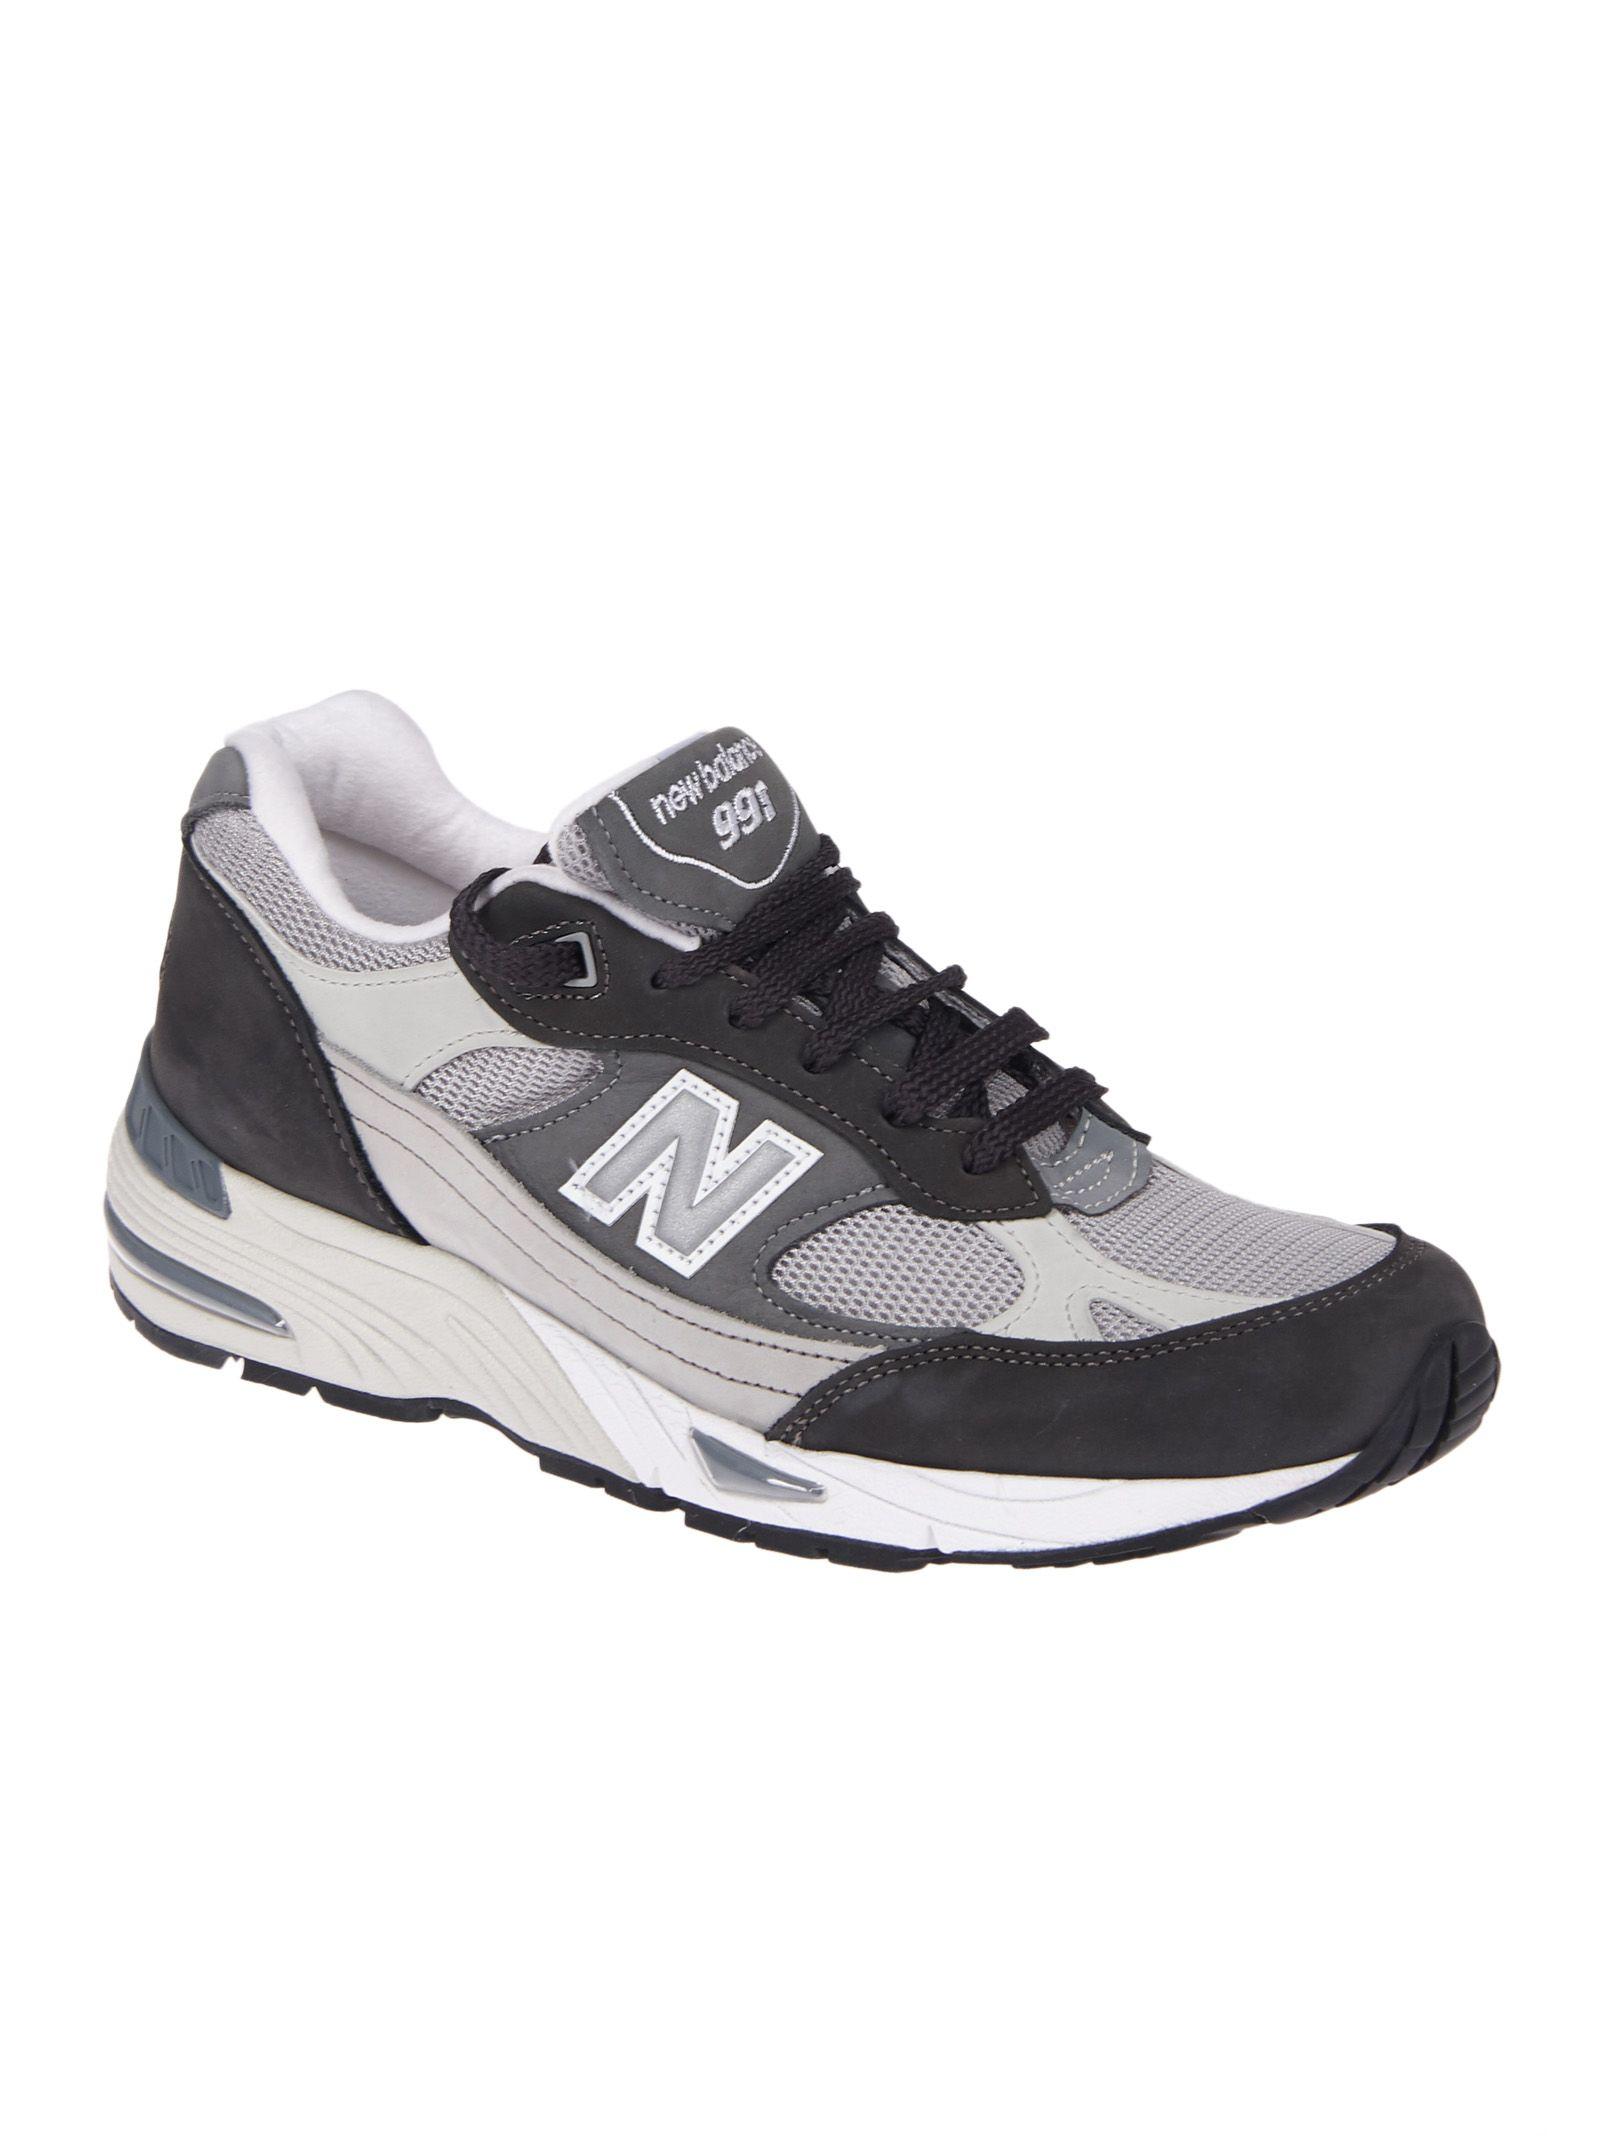 New Balance - New Balance Gartner Sports Sneakers - Grey white ...